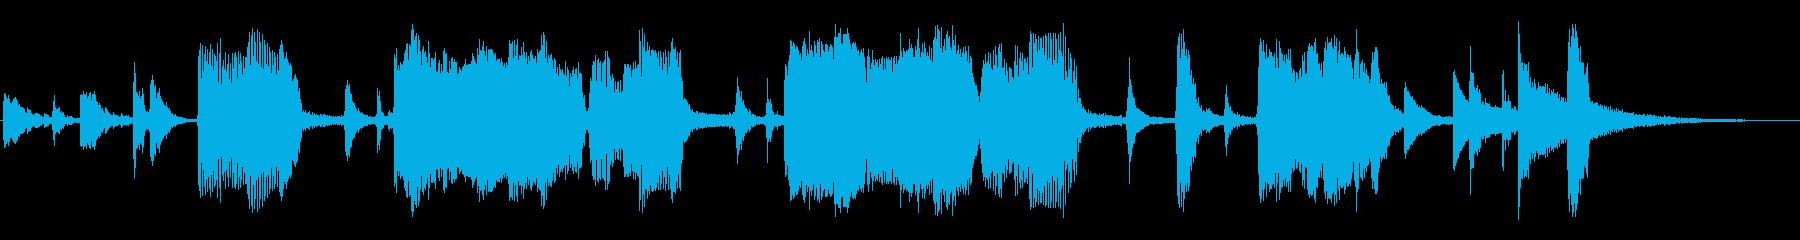 T.V.コンテンポラリー。卑劣ない...の再生済みの波形